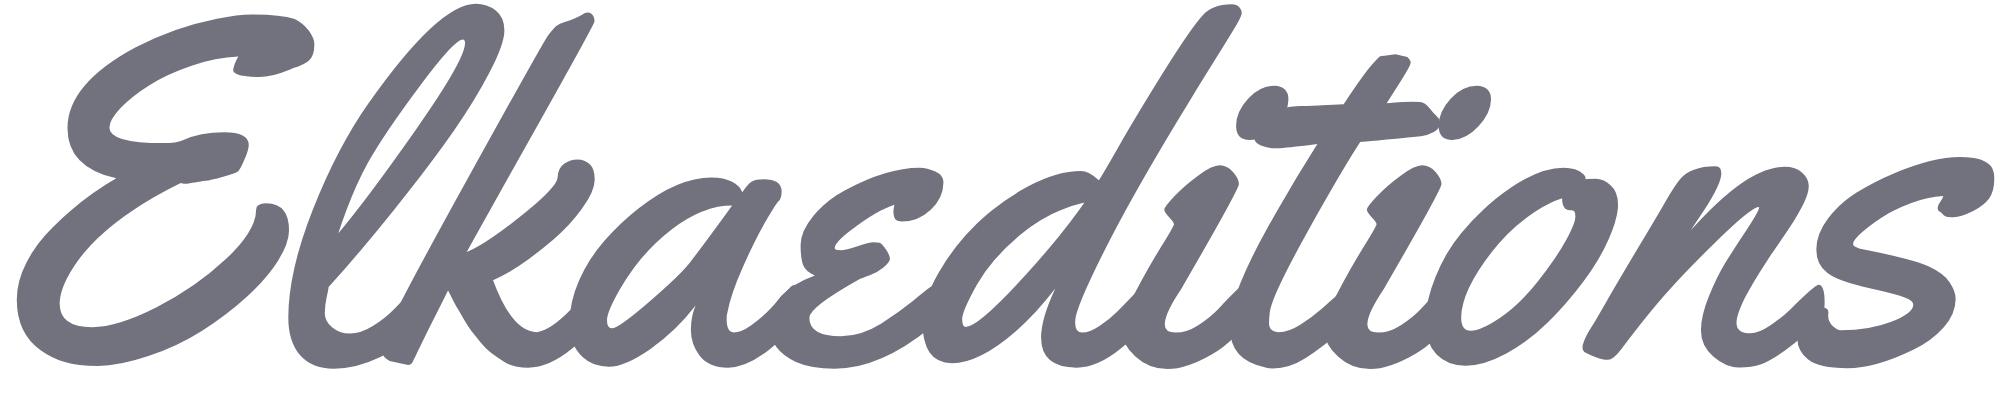 Elkaeditions